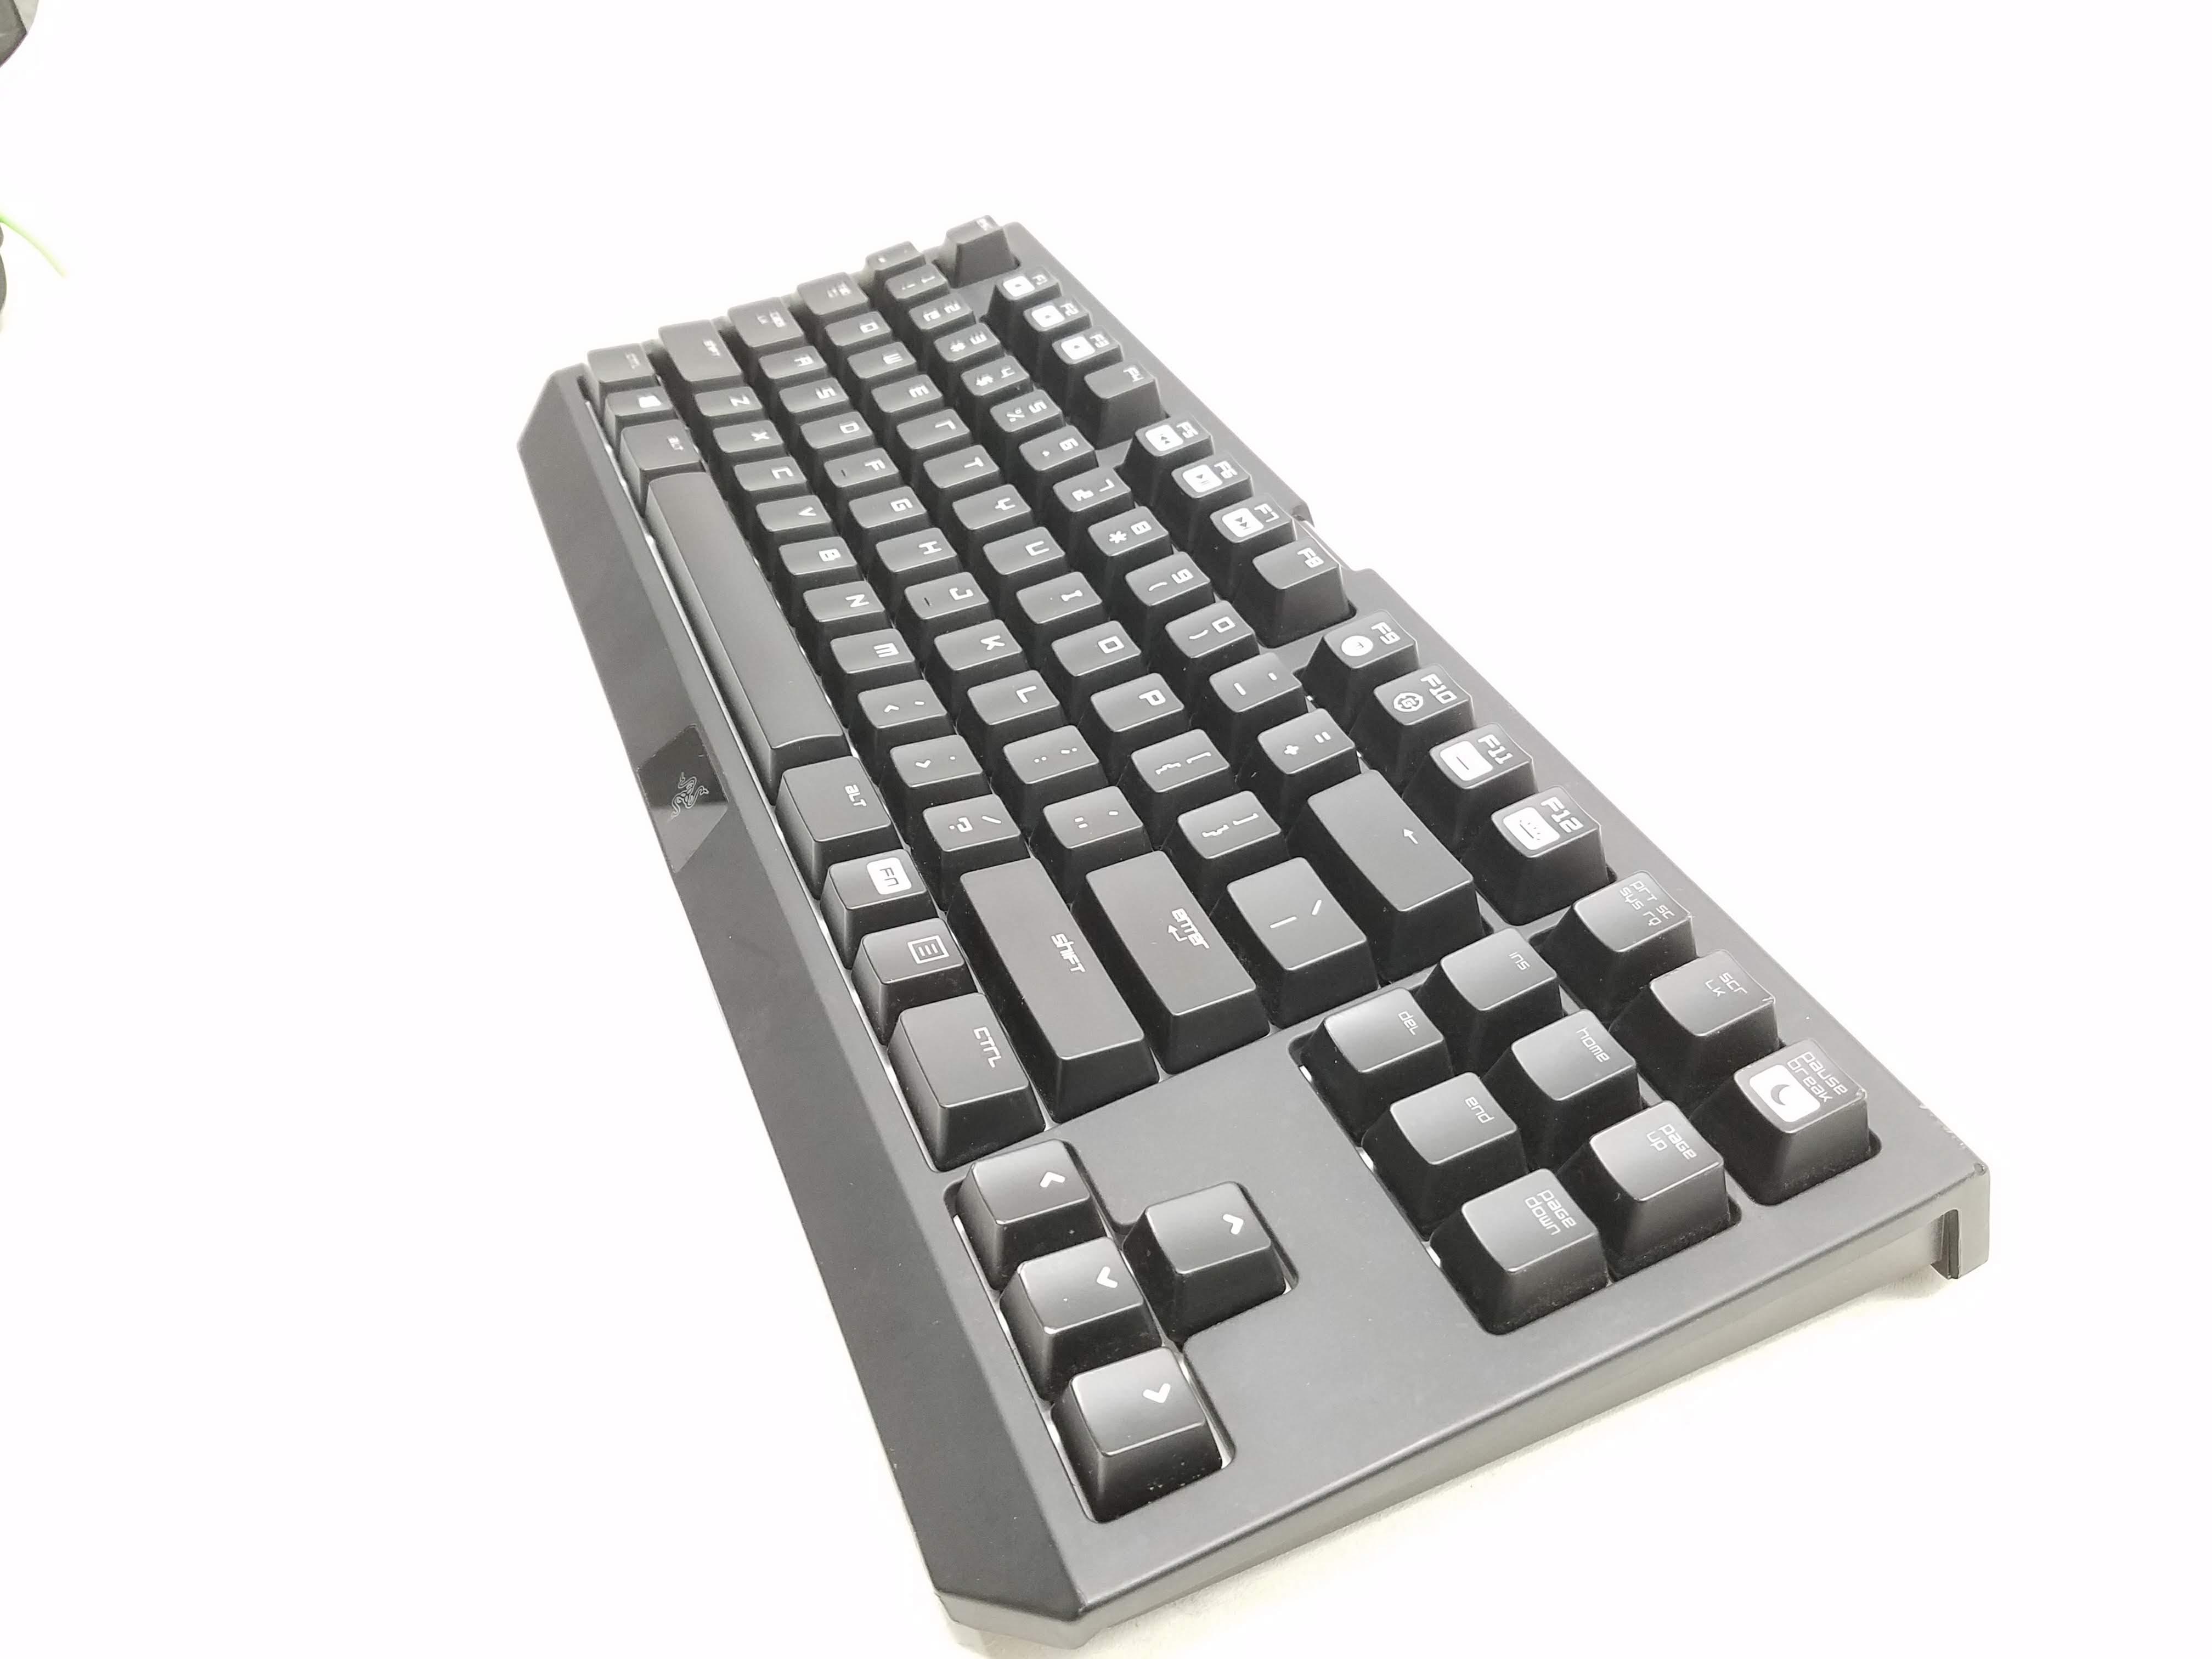 Details about Razer BlackWidow Tournament Edition Chroma RGB Mechanical  Gaming Keyboard Read